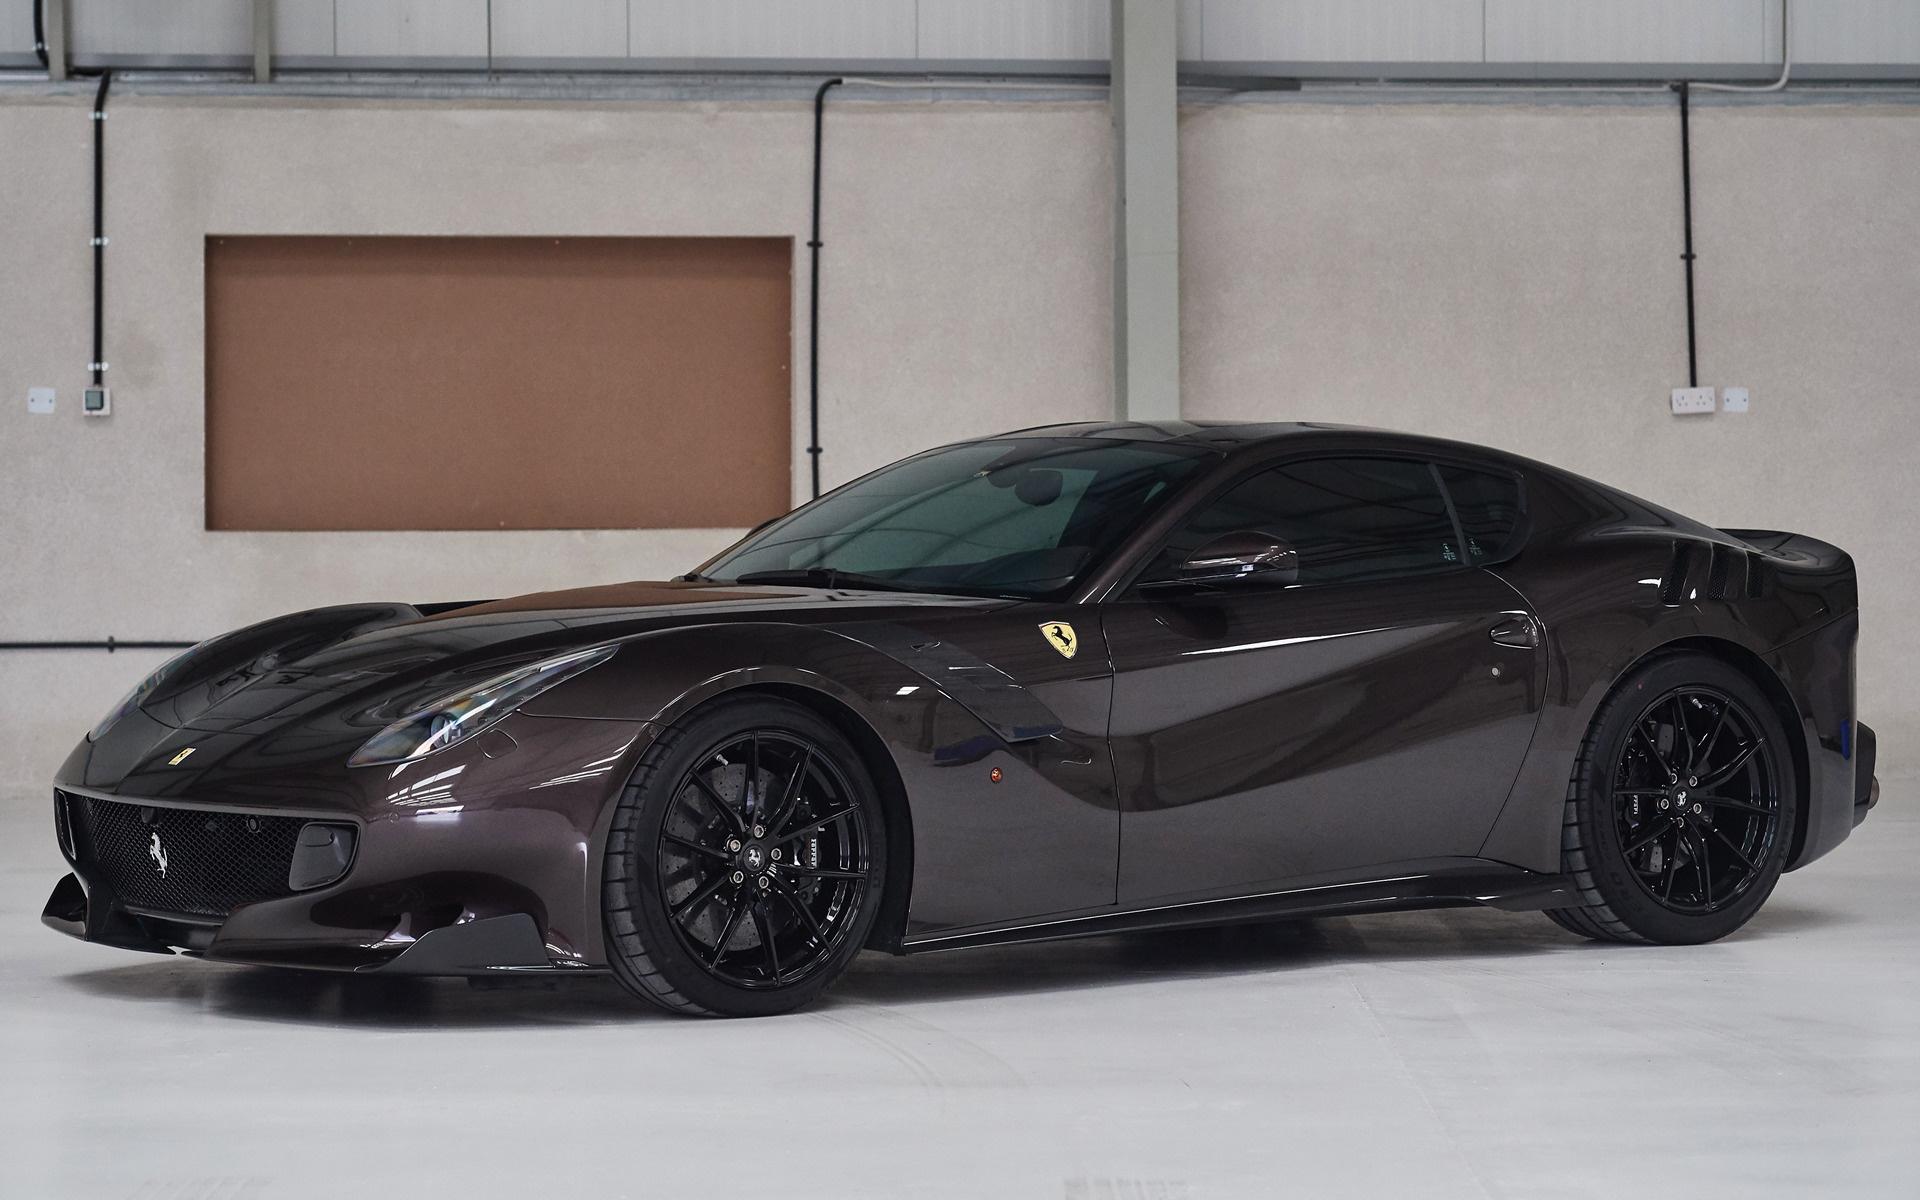 2016 Ferrari F12tdf Tailor Made Hintergrundbilder Und Wallpaper In Hd Car Pixel